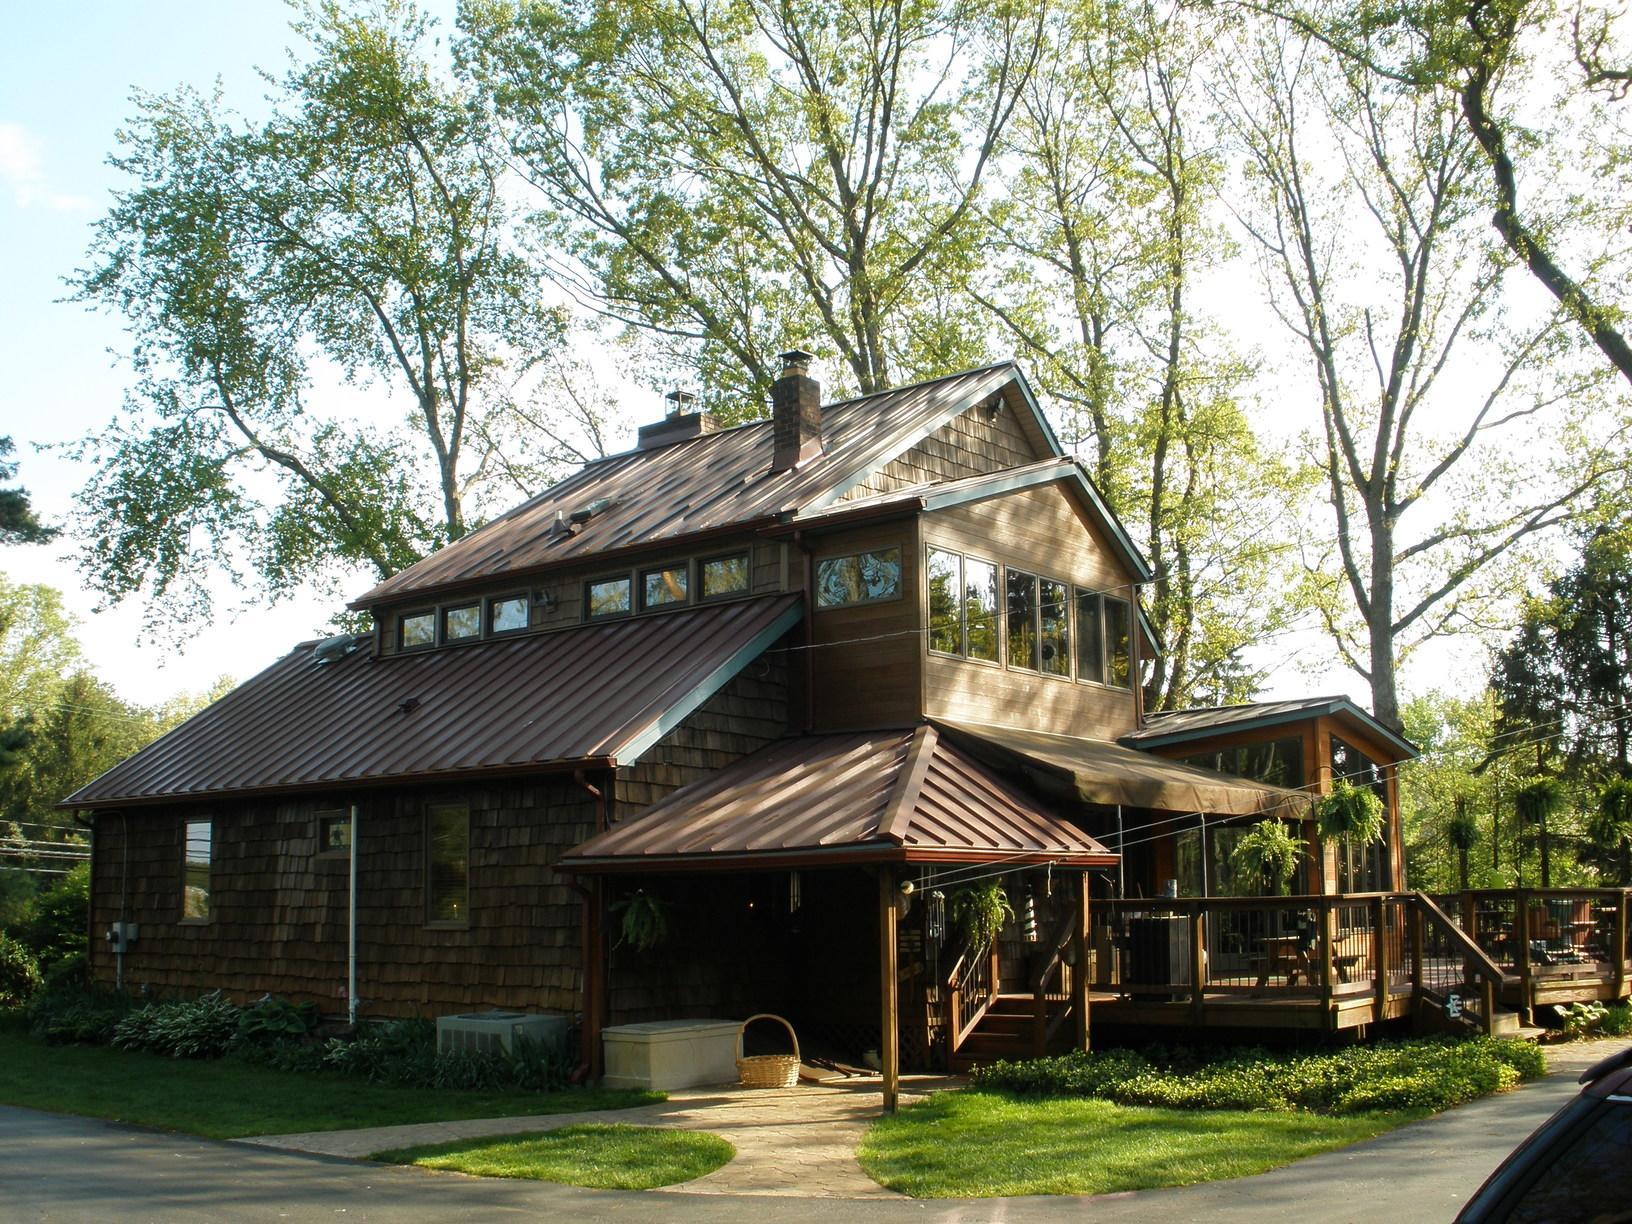 Burgundy Standing Seam Metal Roof Install on Rustic Home in Jackson, NJ